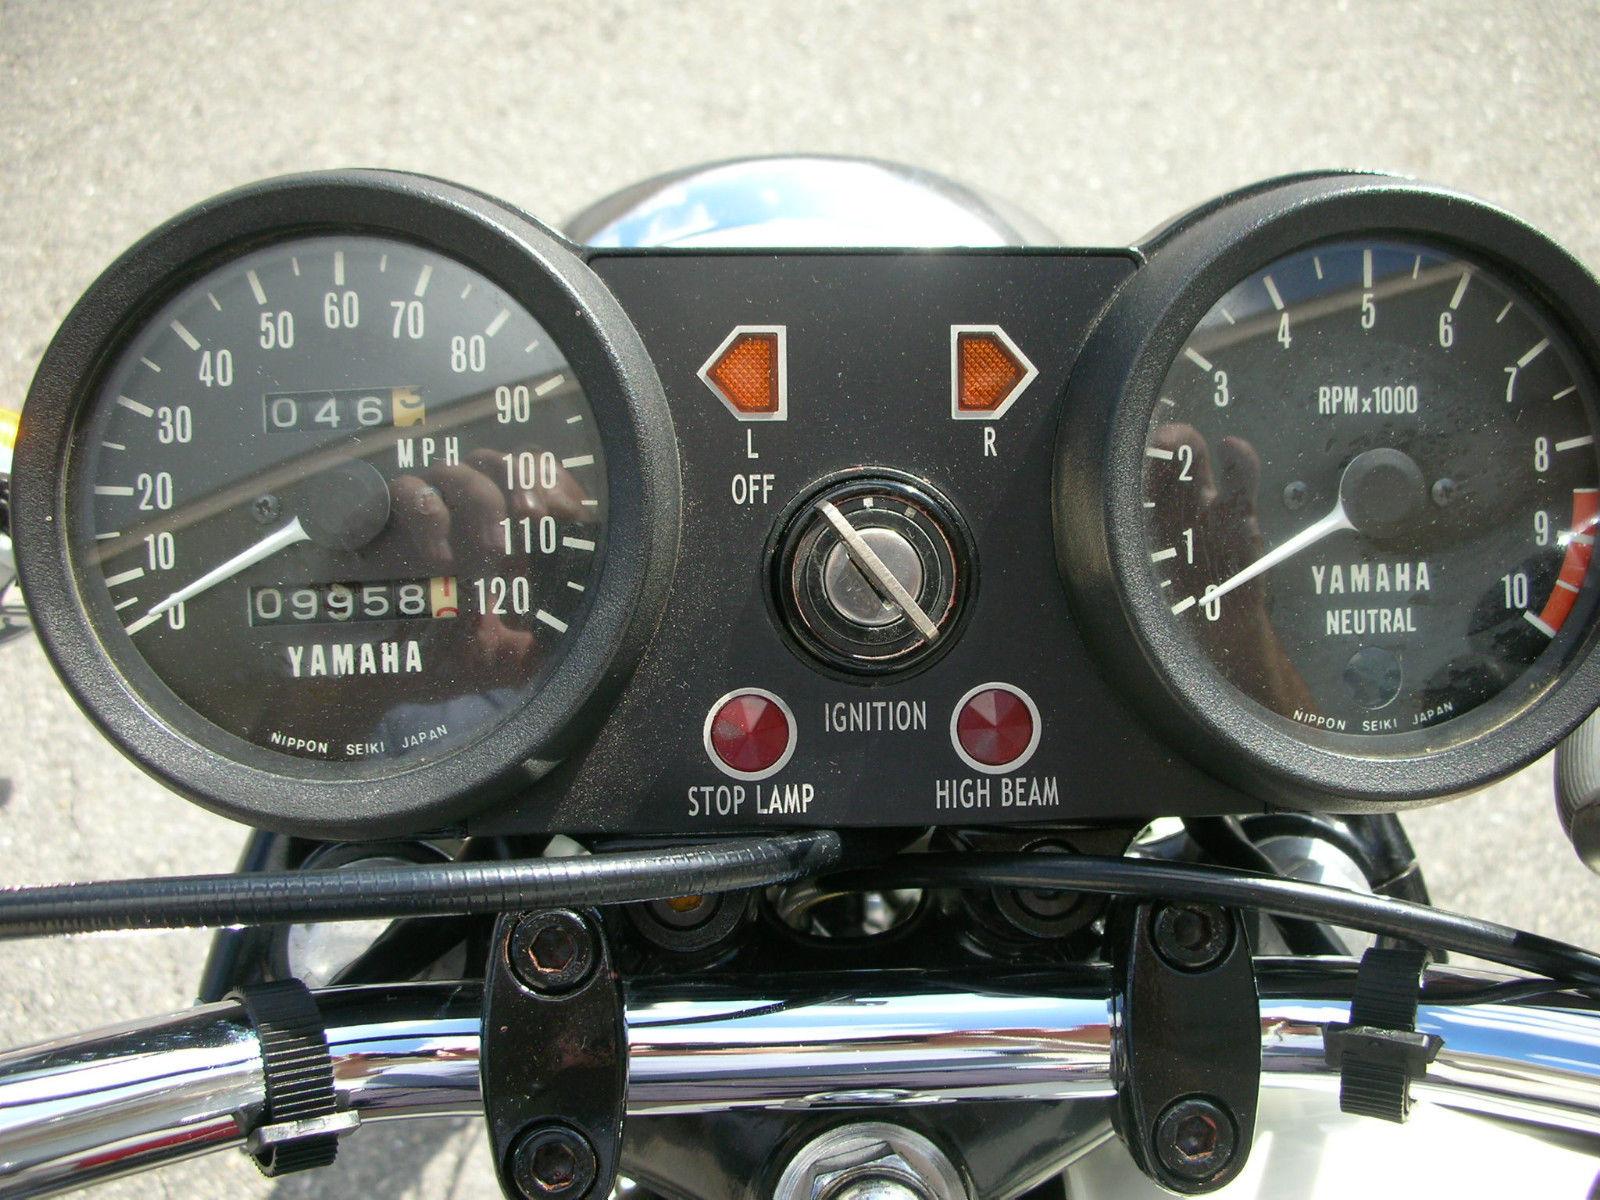 Yamaha RD250B - 1975 - Clocks, Ignition Switch and Lights.